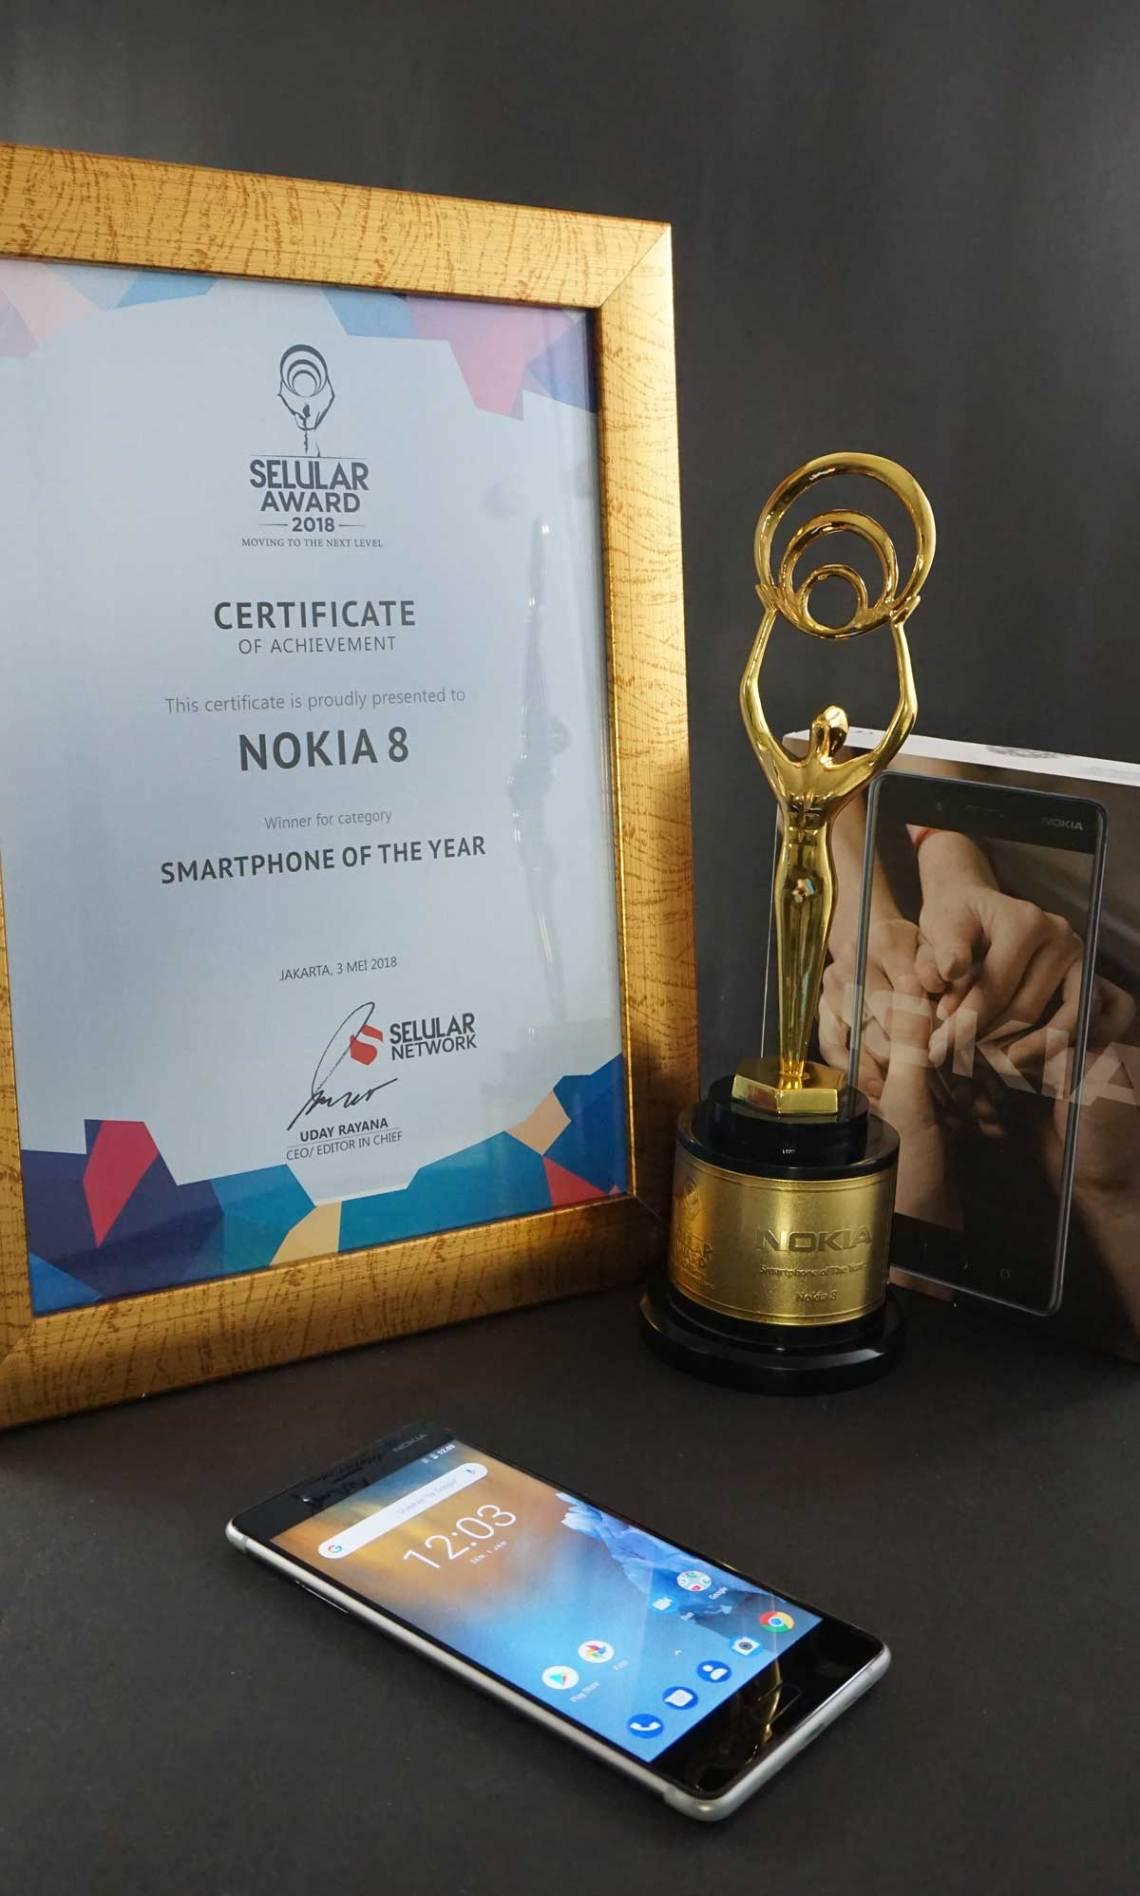 Smartphone Nokia memenangkan dua kategori bergengsi, yaitu Smartphone of The Year untuk Nokia 8 dan Best Build Quality untuk Nokia 6.